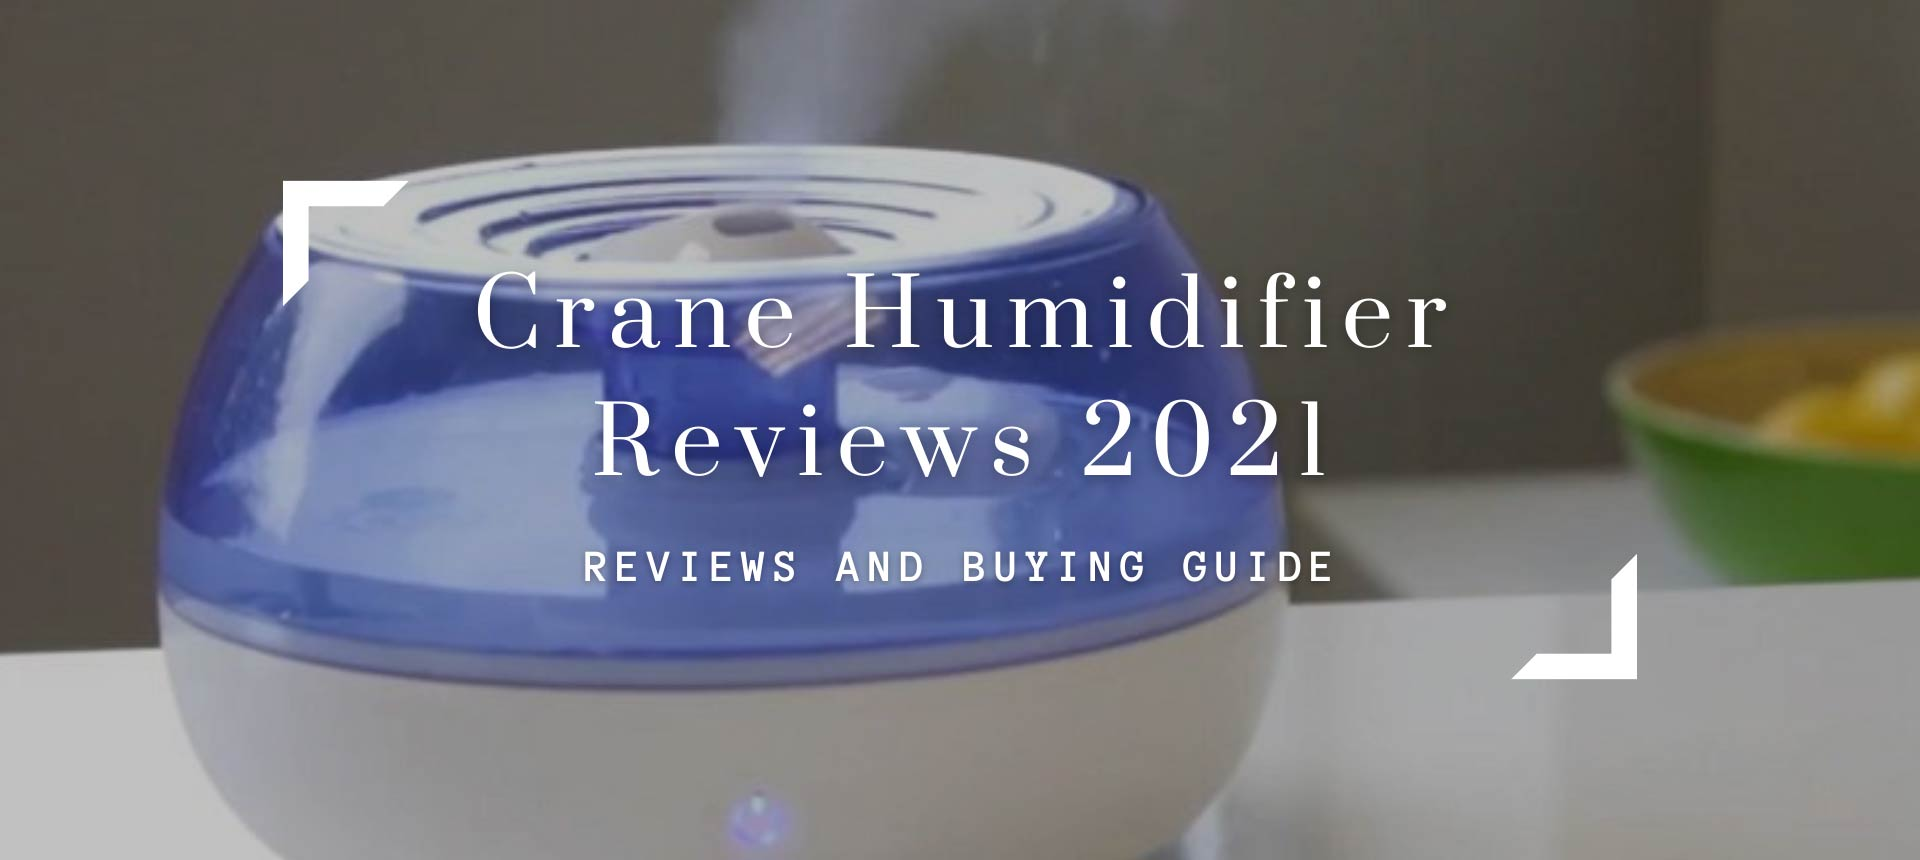 Crane Humidifier Reviews 2021 - Best Model